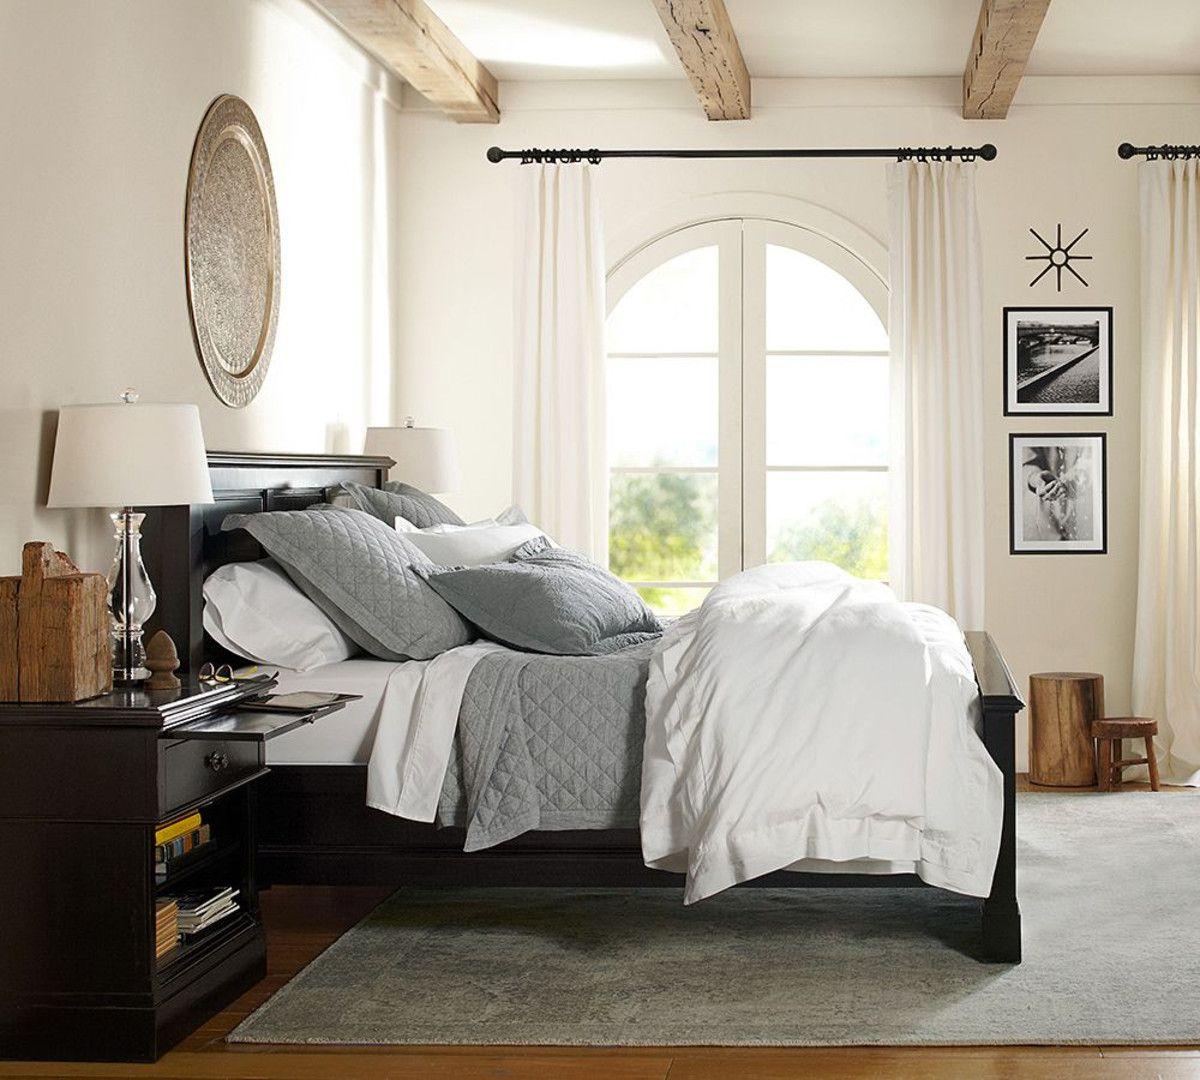 Best Branford Bed Pottery Barn Australia Bedroom Decor 400 x 300